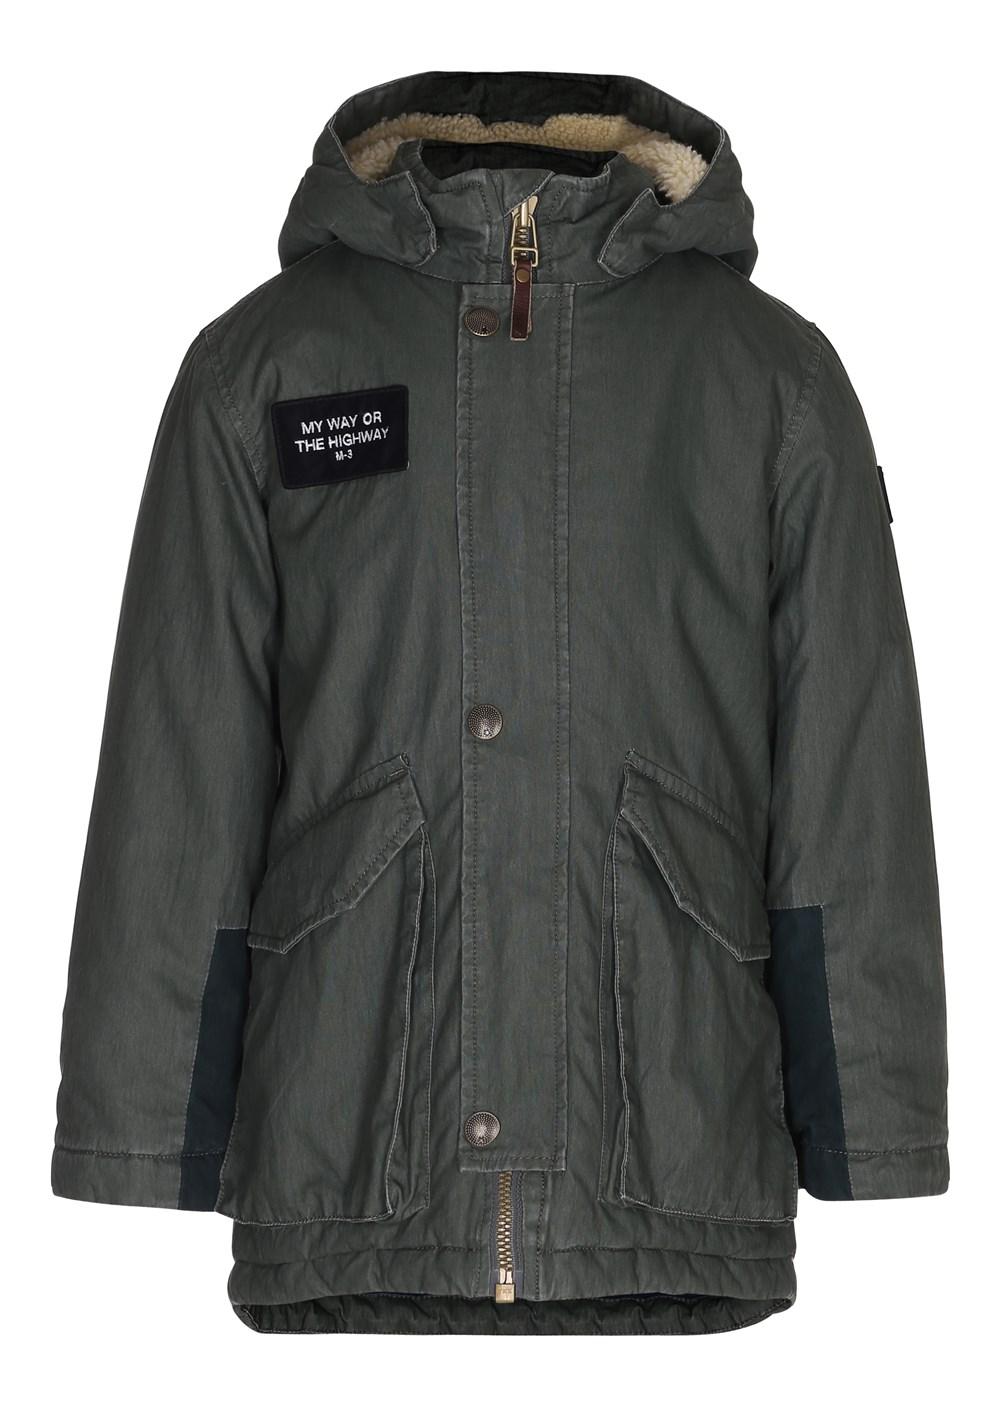 Hewson - Deep Silver Pine - Hewson parka jacket - Deep Silver Pine - Molo